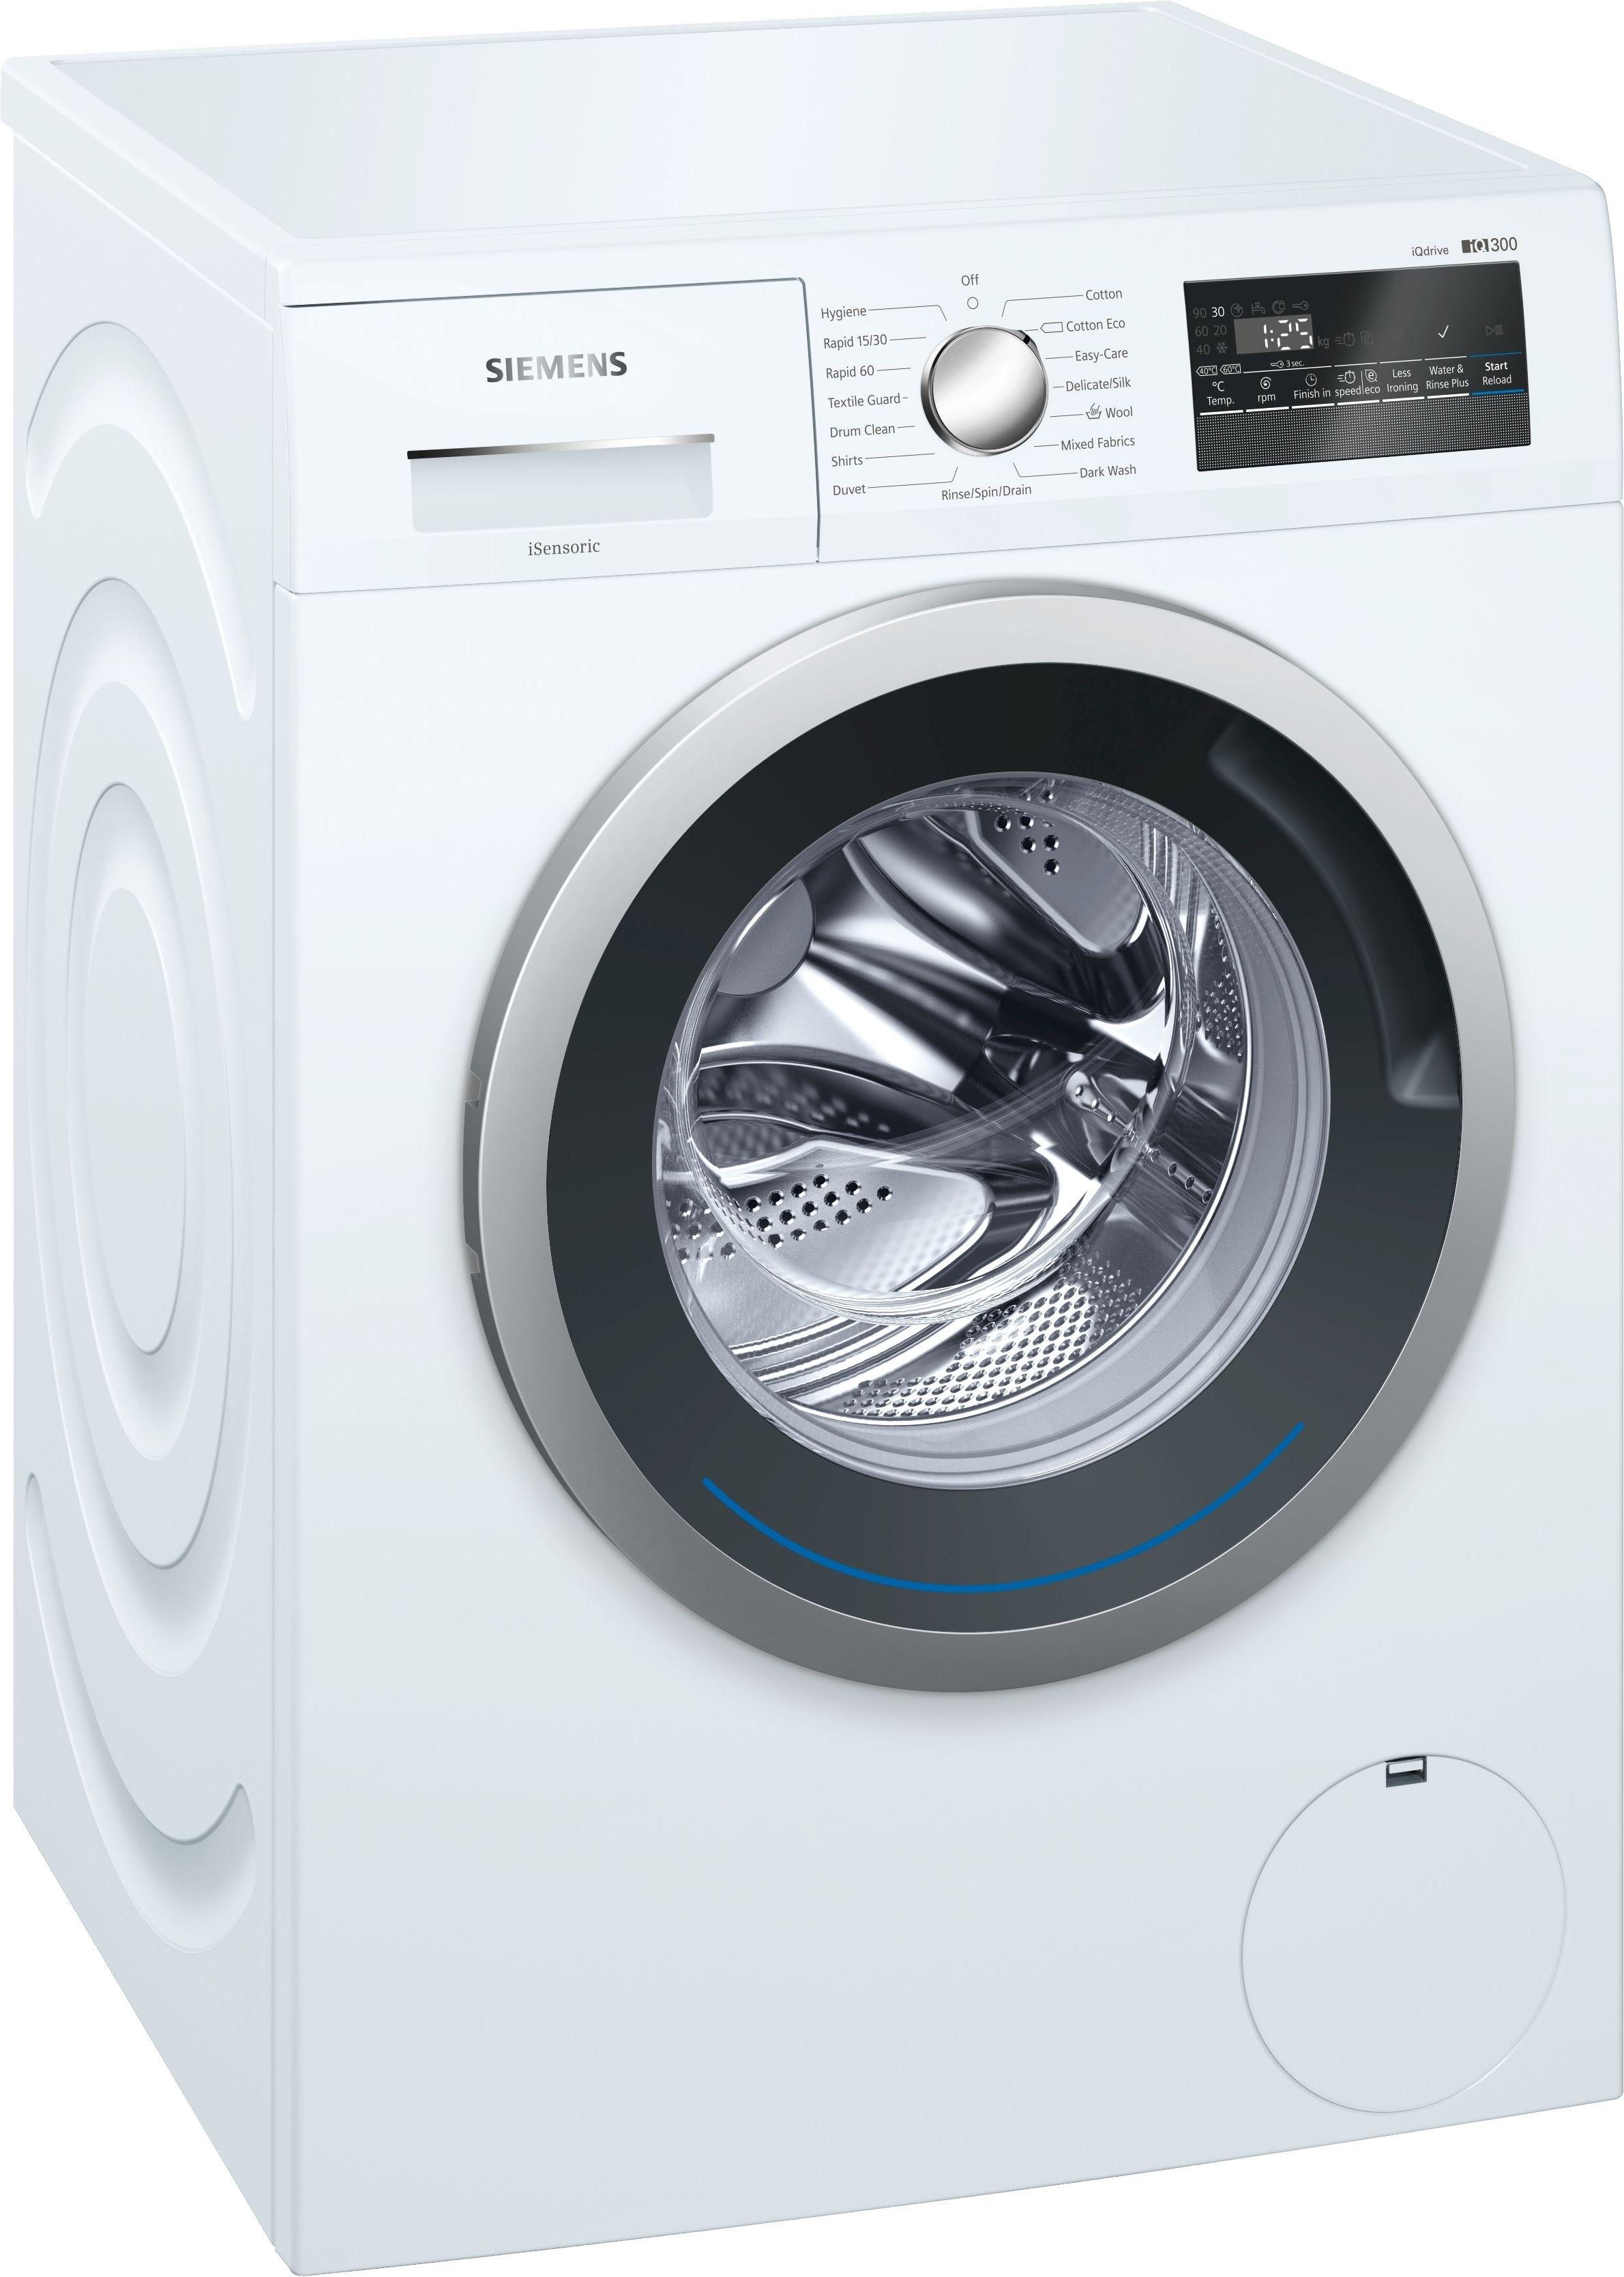 Siemens WM12N201GB 8kg 1200rpm Washing Machine 5 Year Guarantee